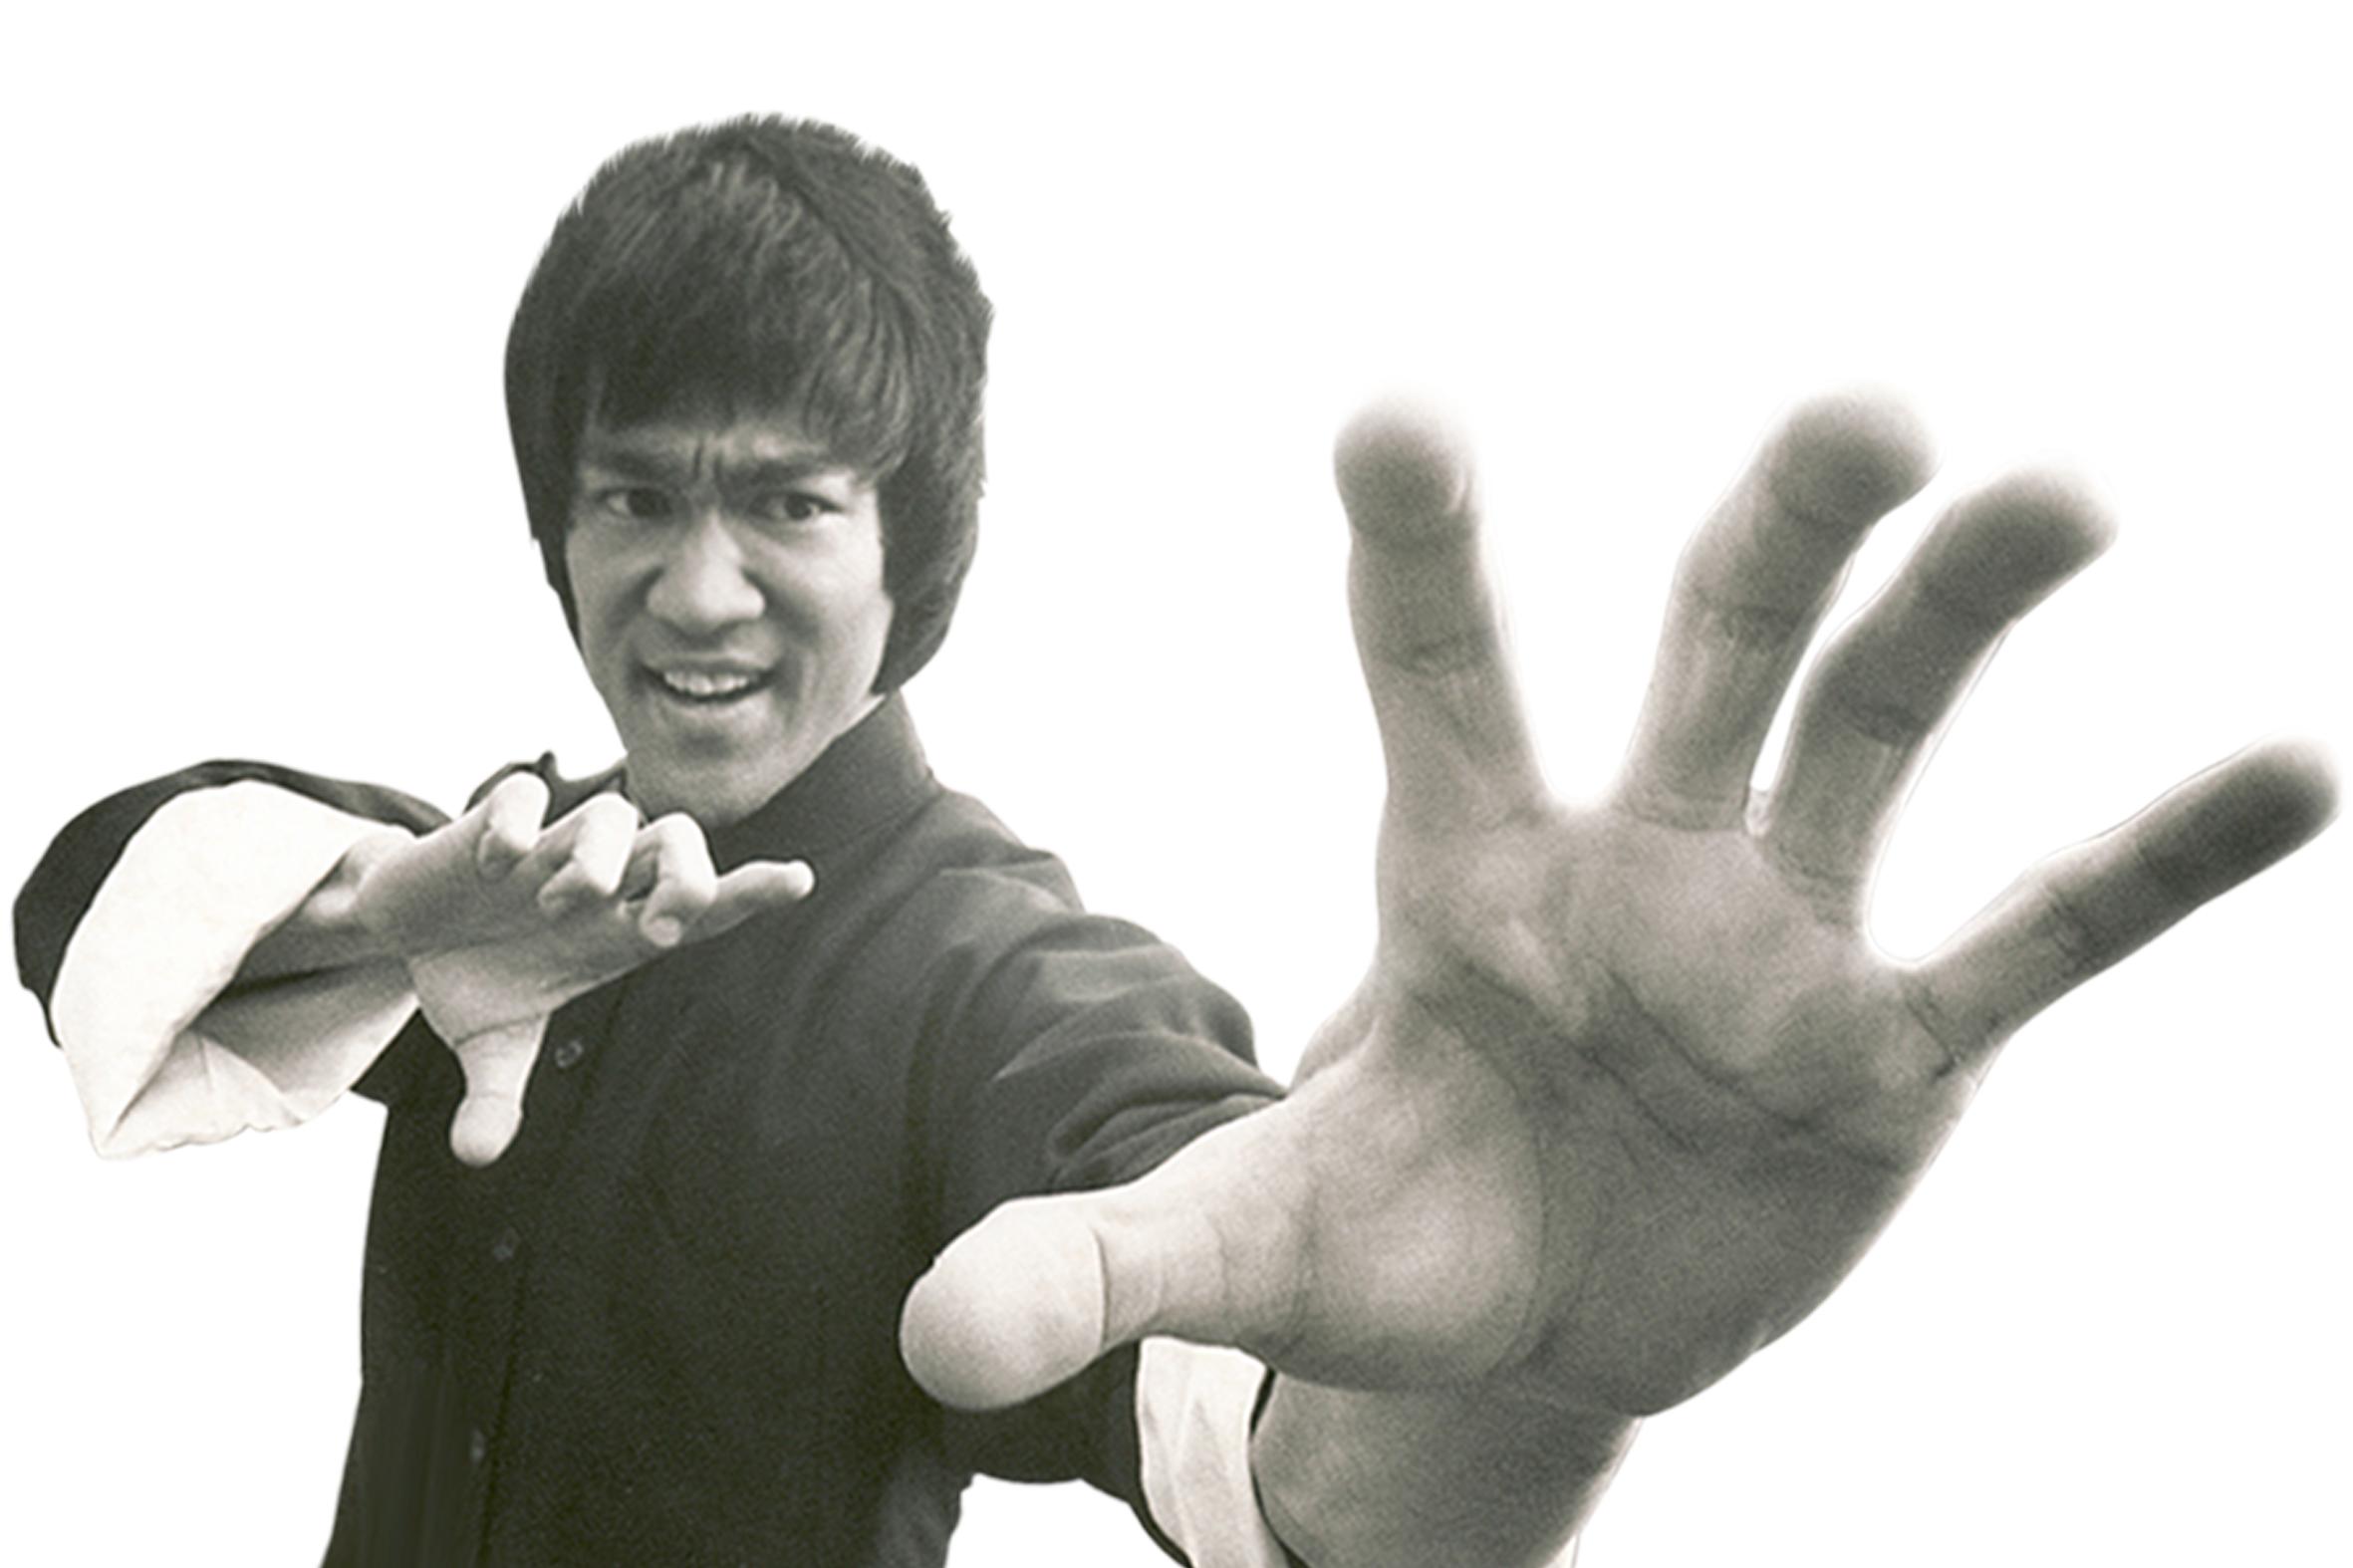 Bruce_Lee_Pic_1.jpg